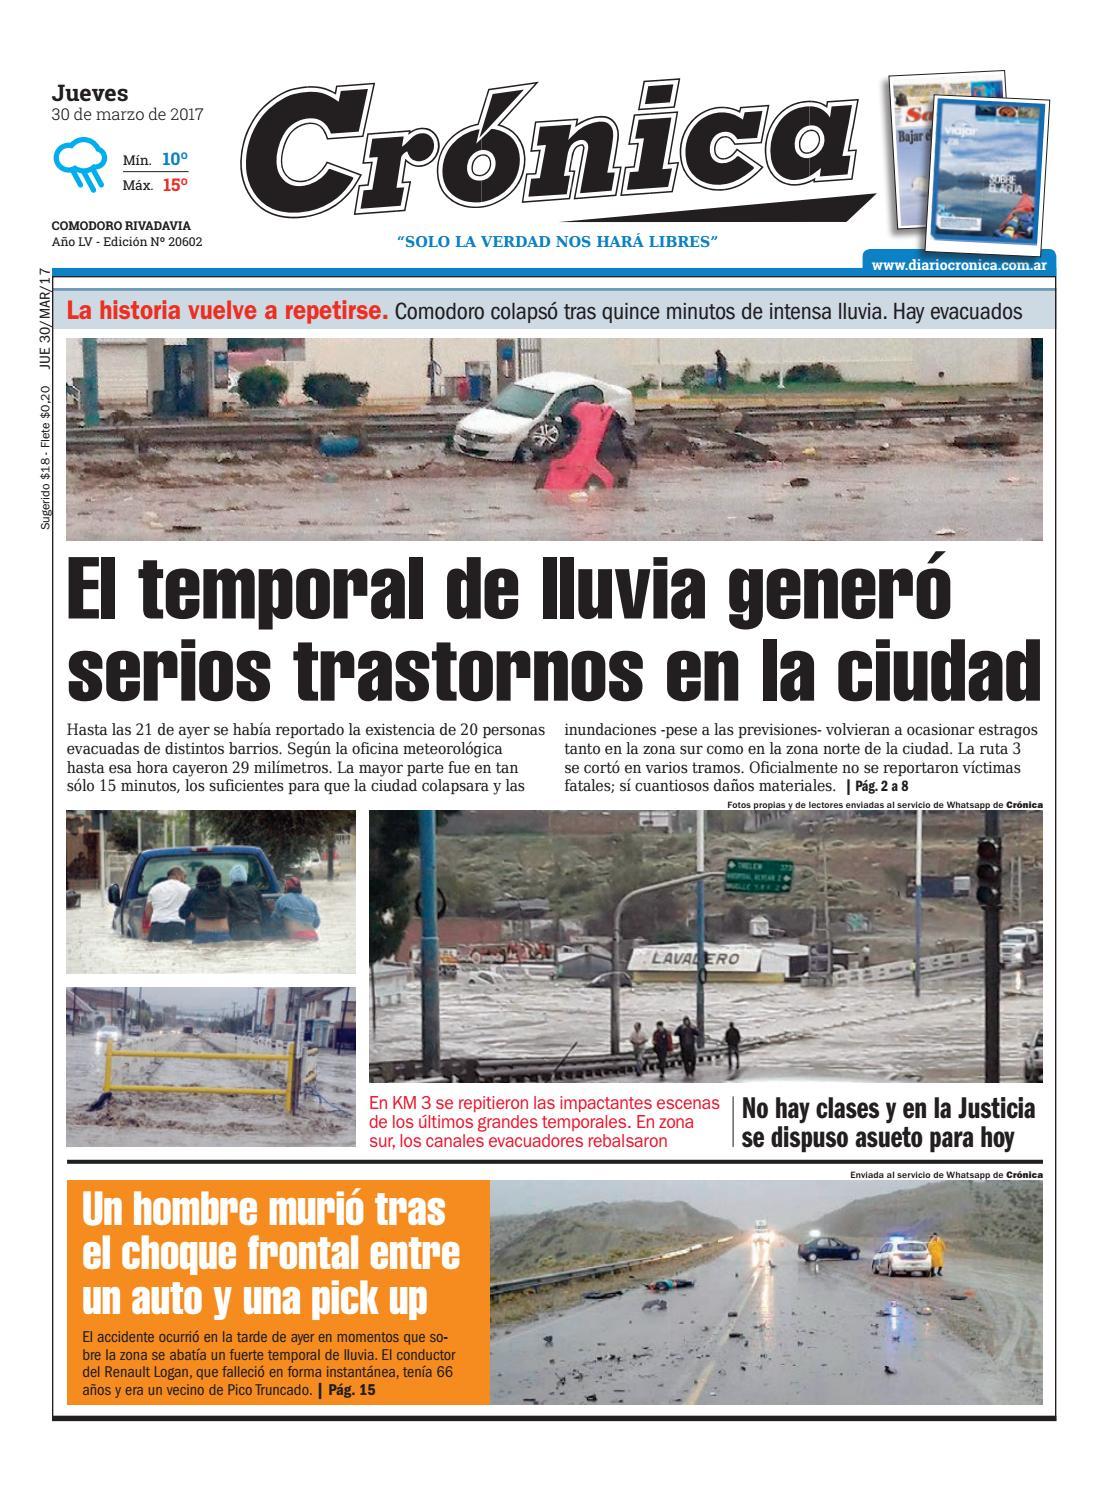 Ee7ec29d5624af1f0109a97b3a9dfe4b by Diario Crónica - issuu